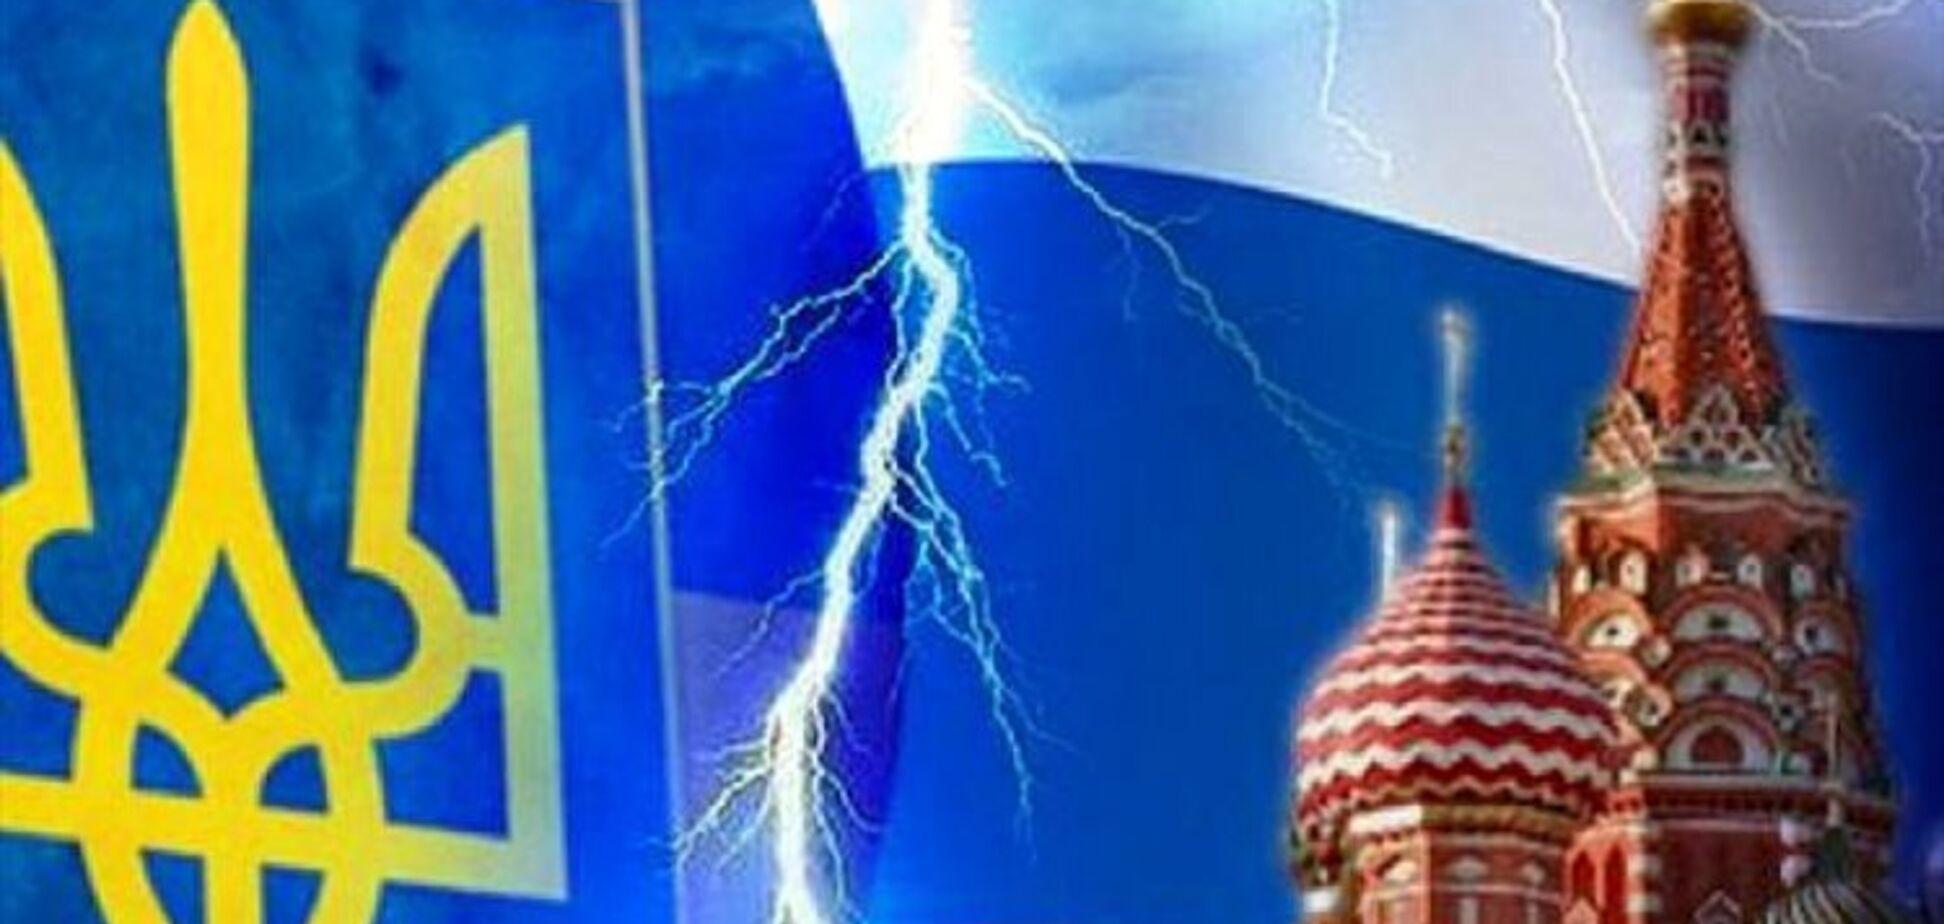 'Потеряете ряд областей': у Путина пригрозили Украине распадом